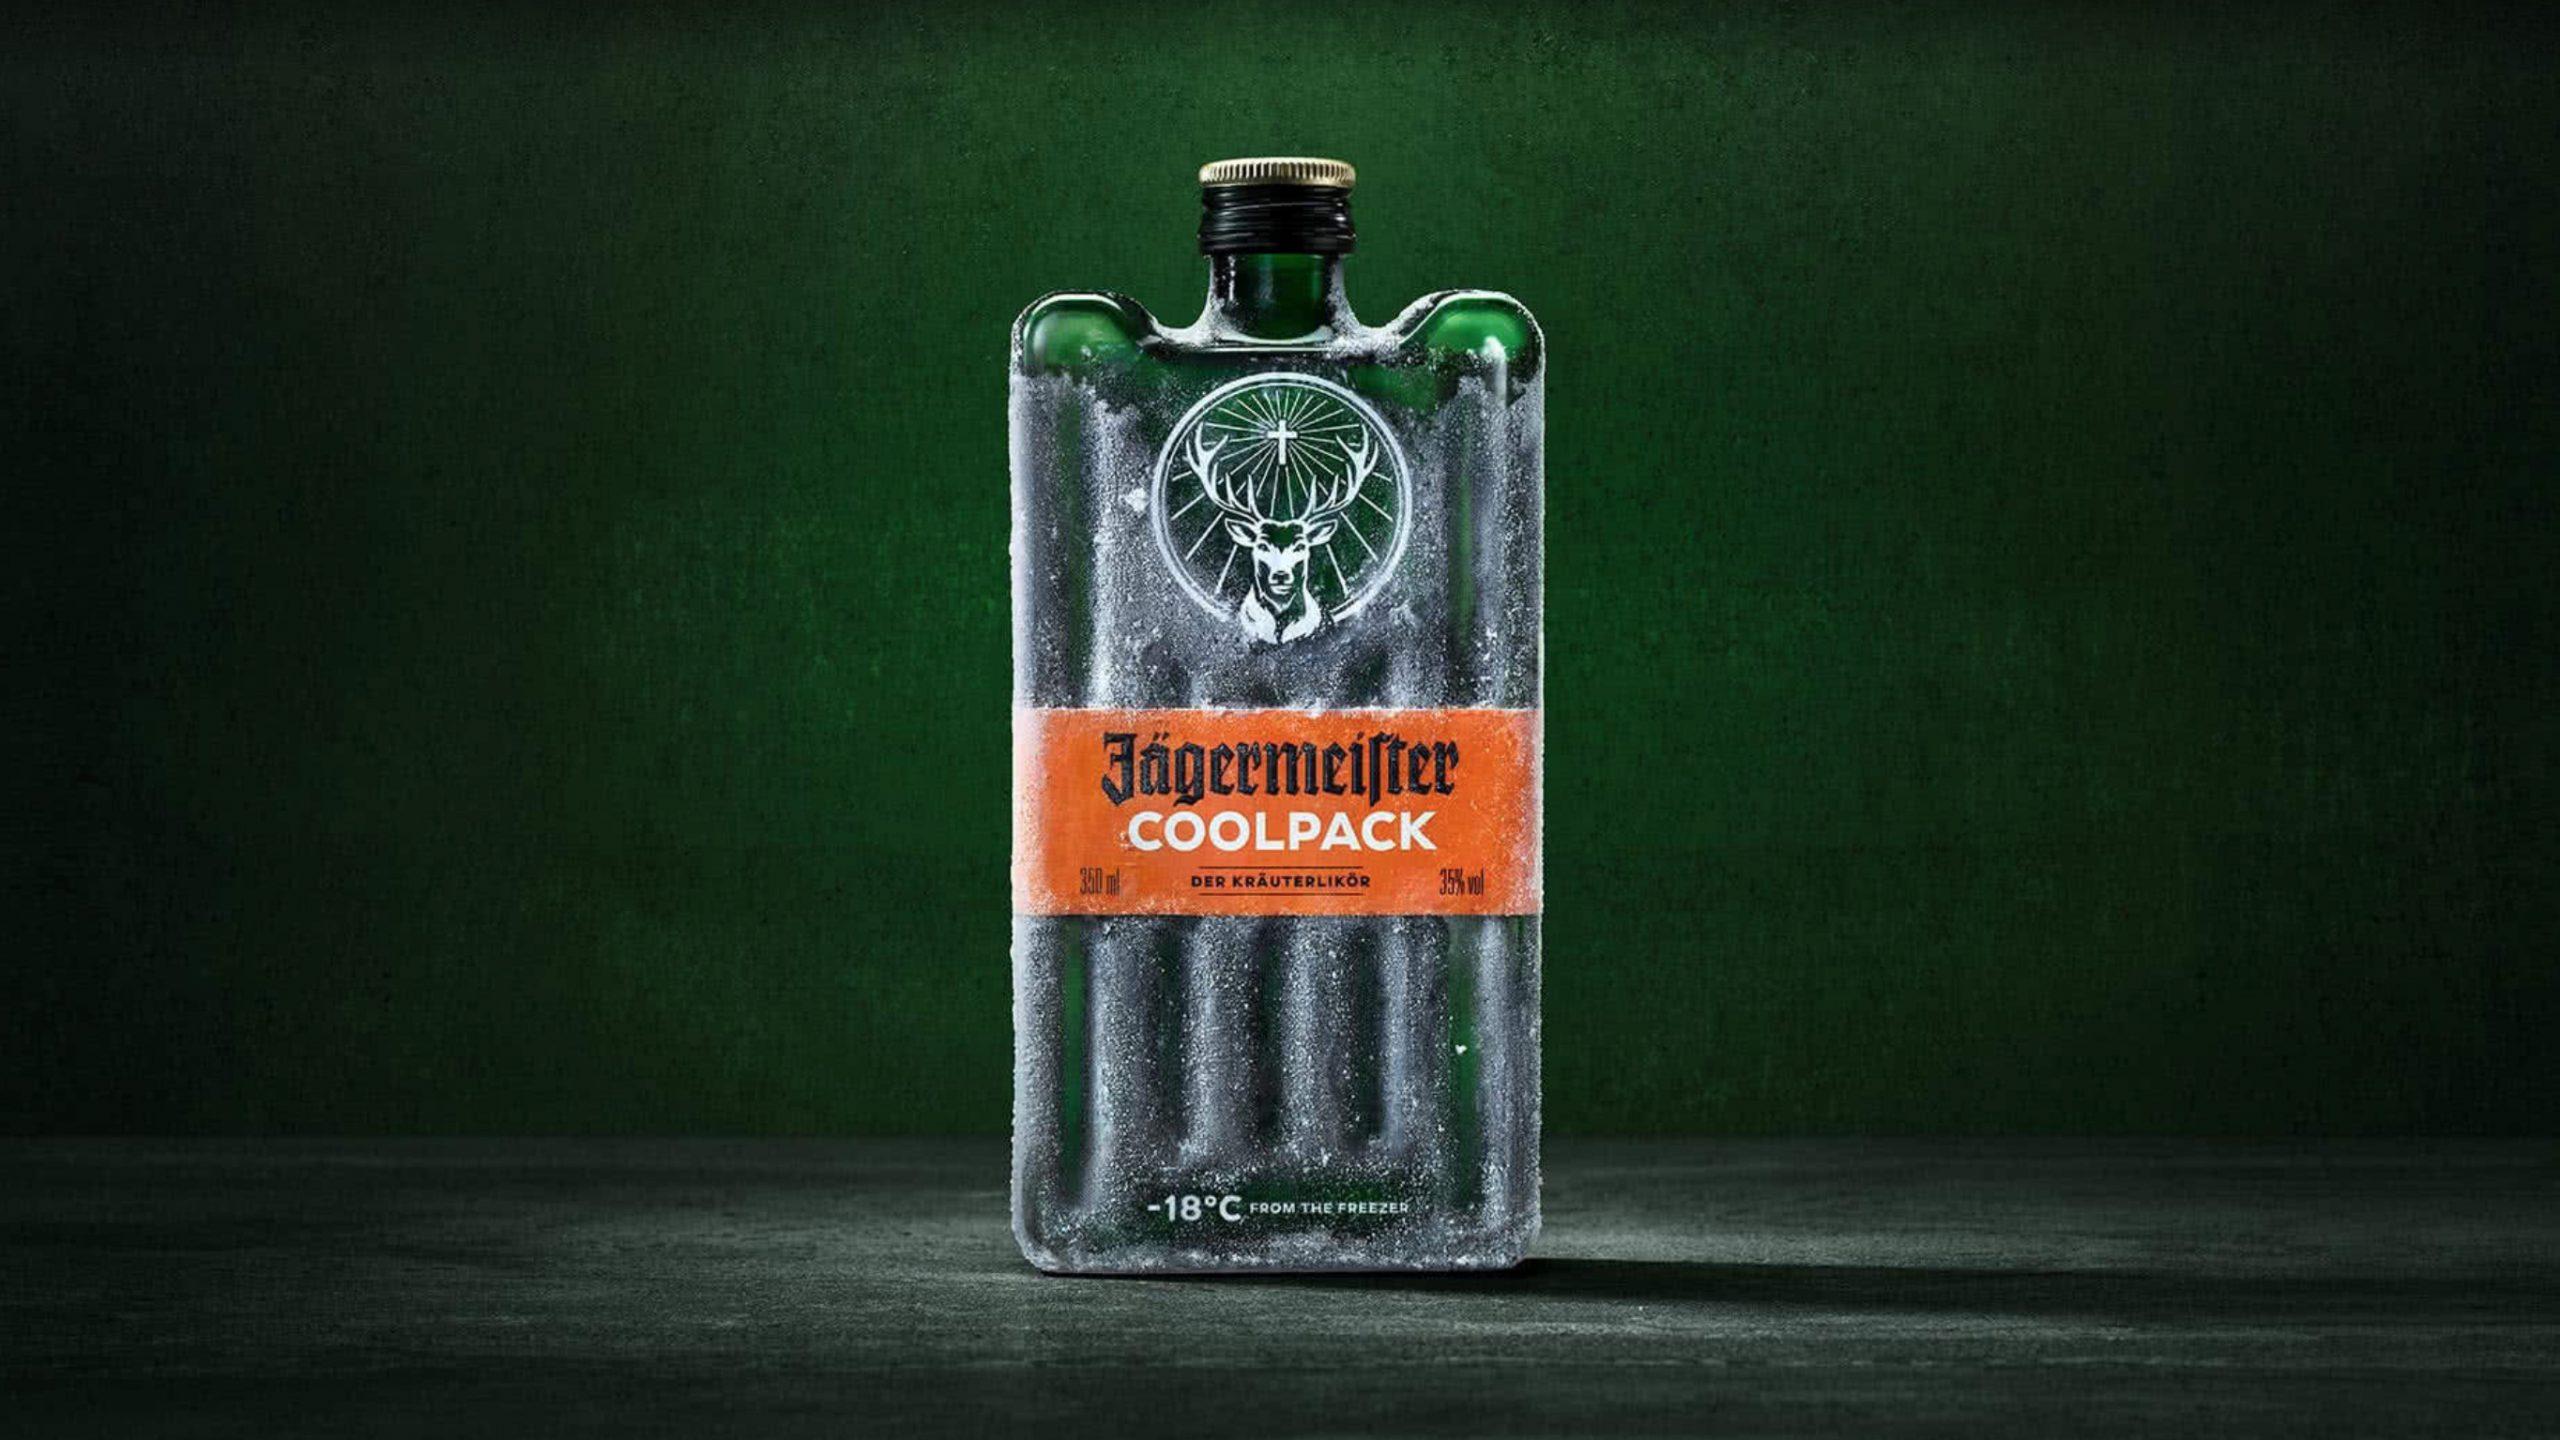 jagermeister_bottle